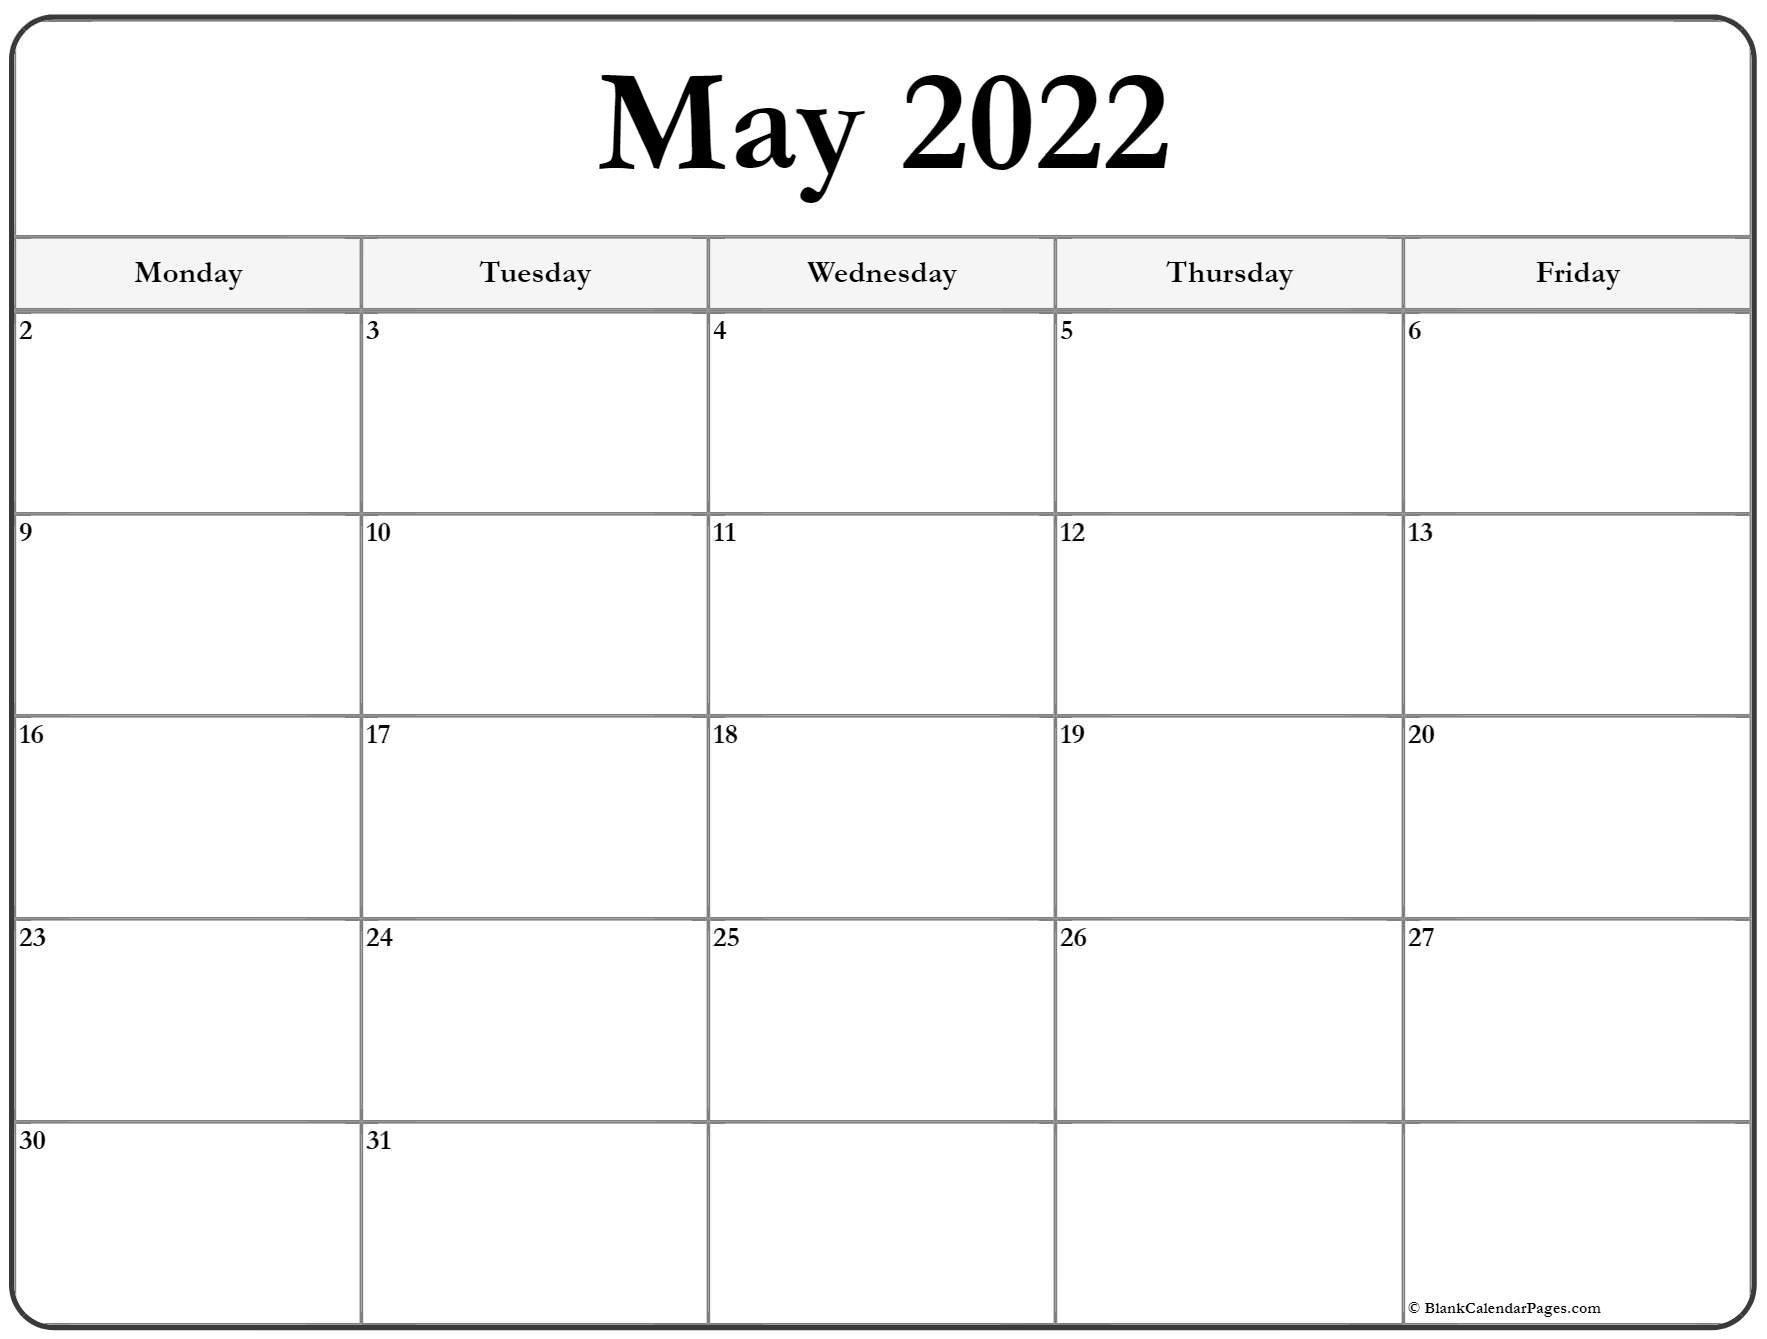 May 2022 Monday Calendar | Monday To Sunday May Calendar Starting On Monday